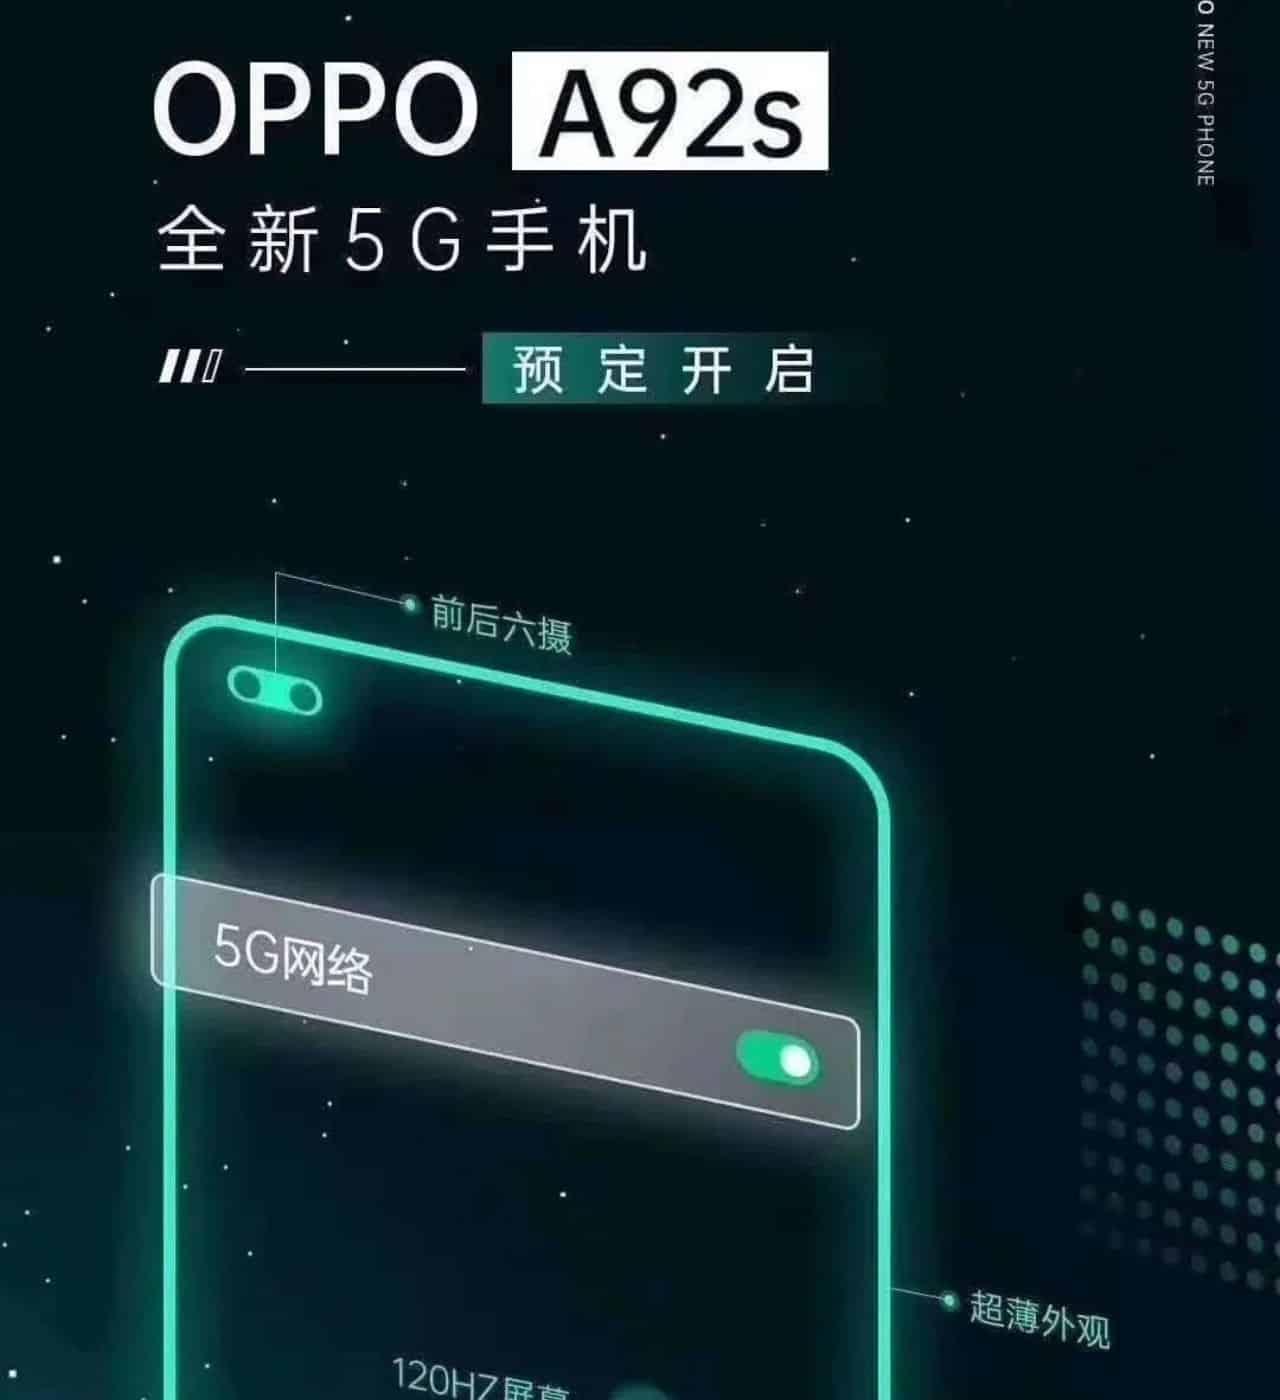 oppo a92s özellikleri